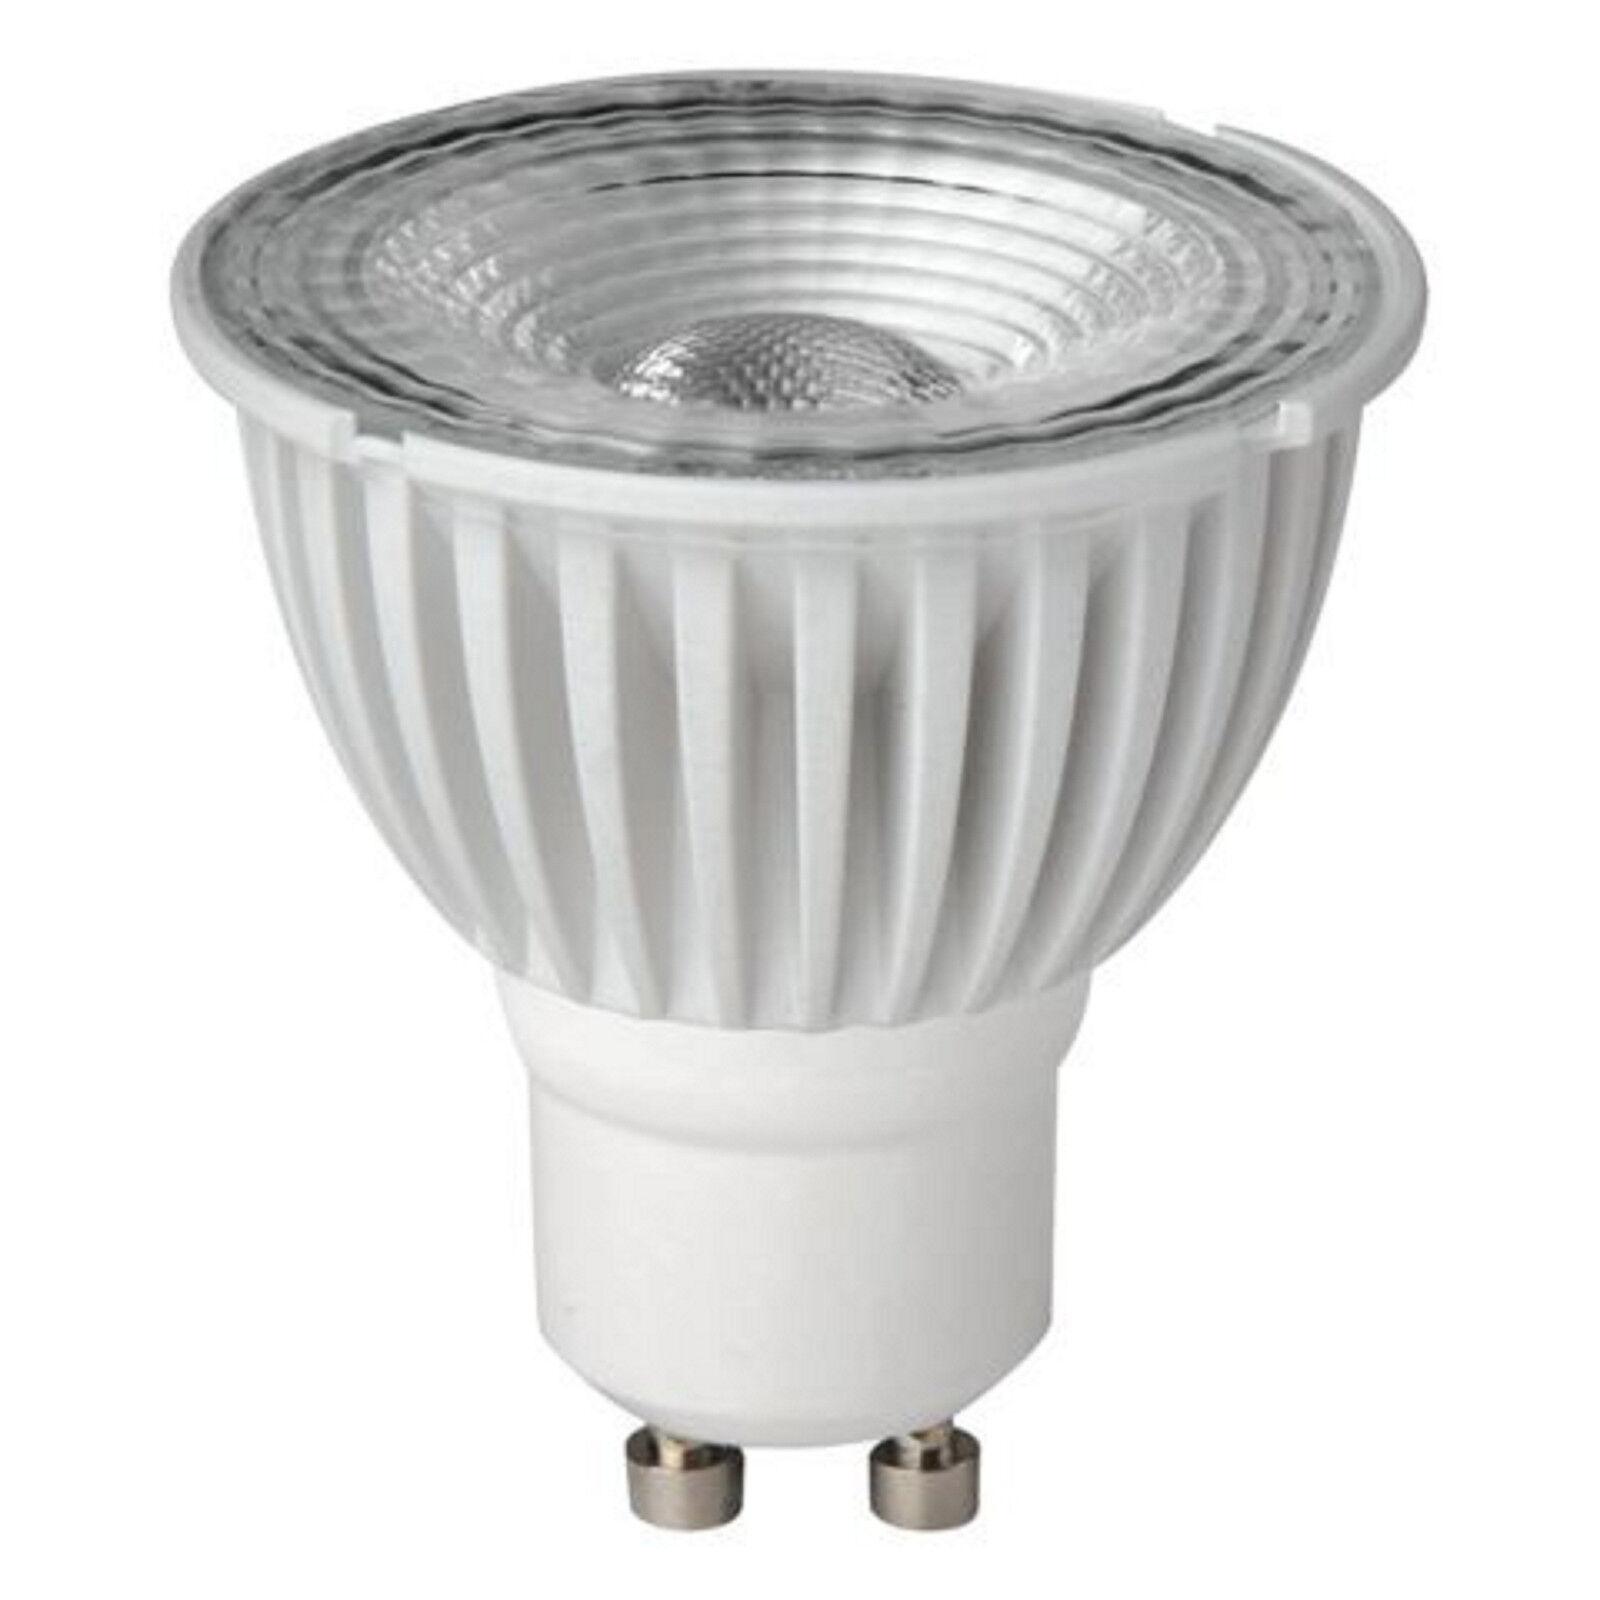 QUALITY MEGAMAN BRANDED LED 7W GU10 PAR16 2800K WARM WHITE